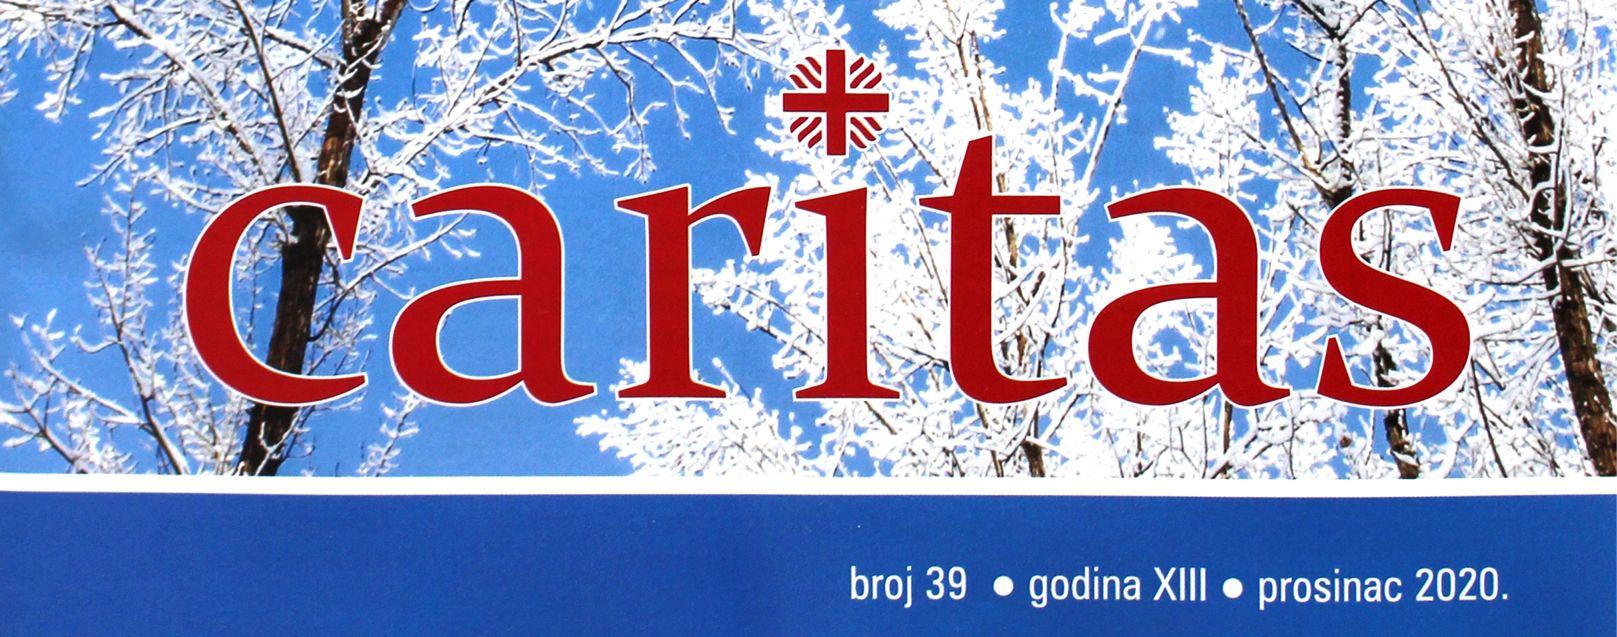 Caritasovo časopis - Humanity First, Caritas piše o akcijama Humanity Firsta